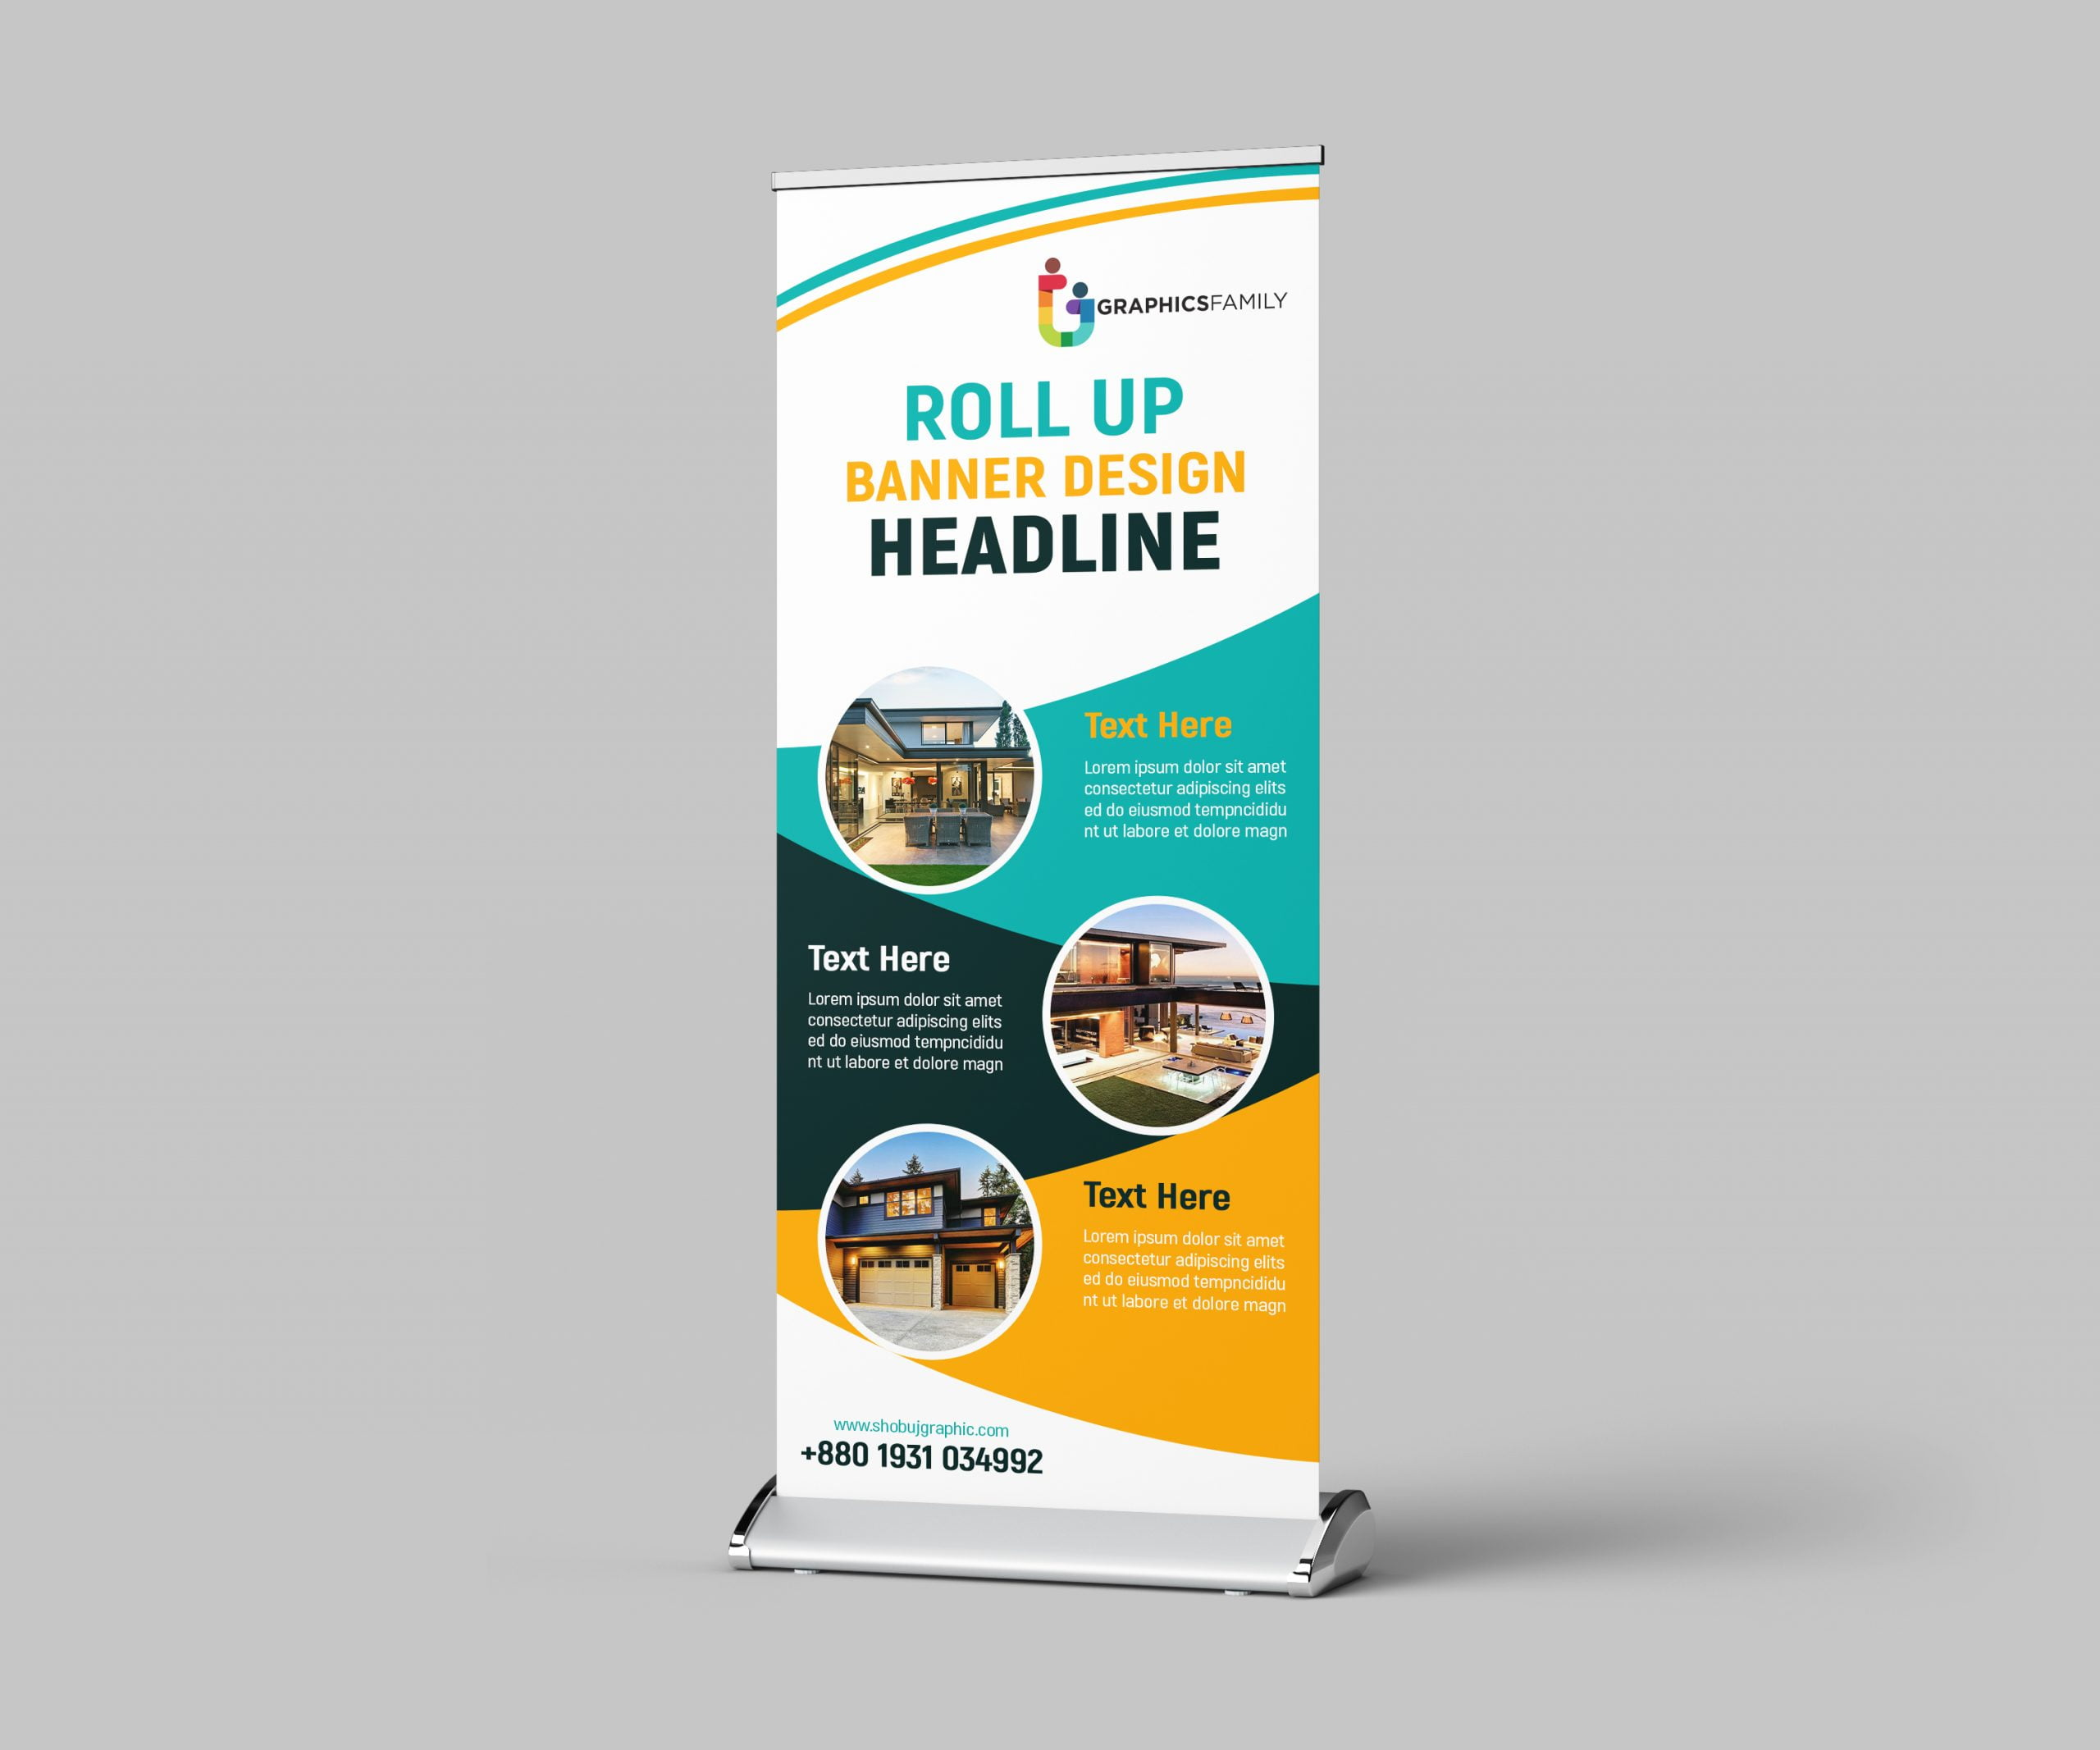 Business roll up design standard banner template free